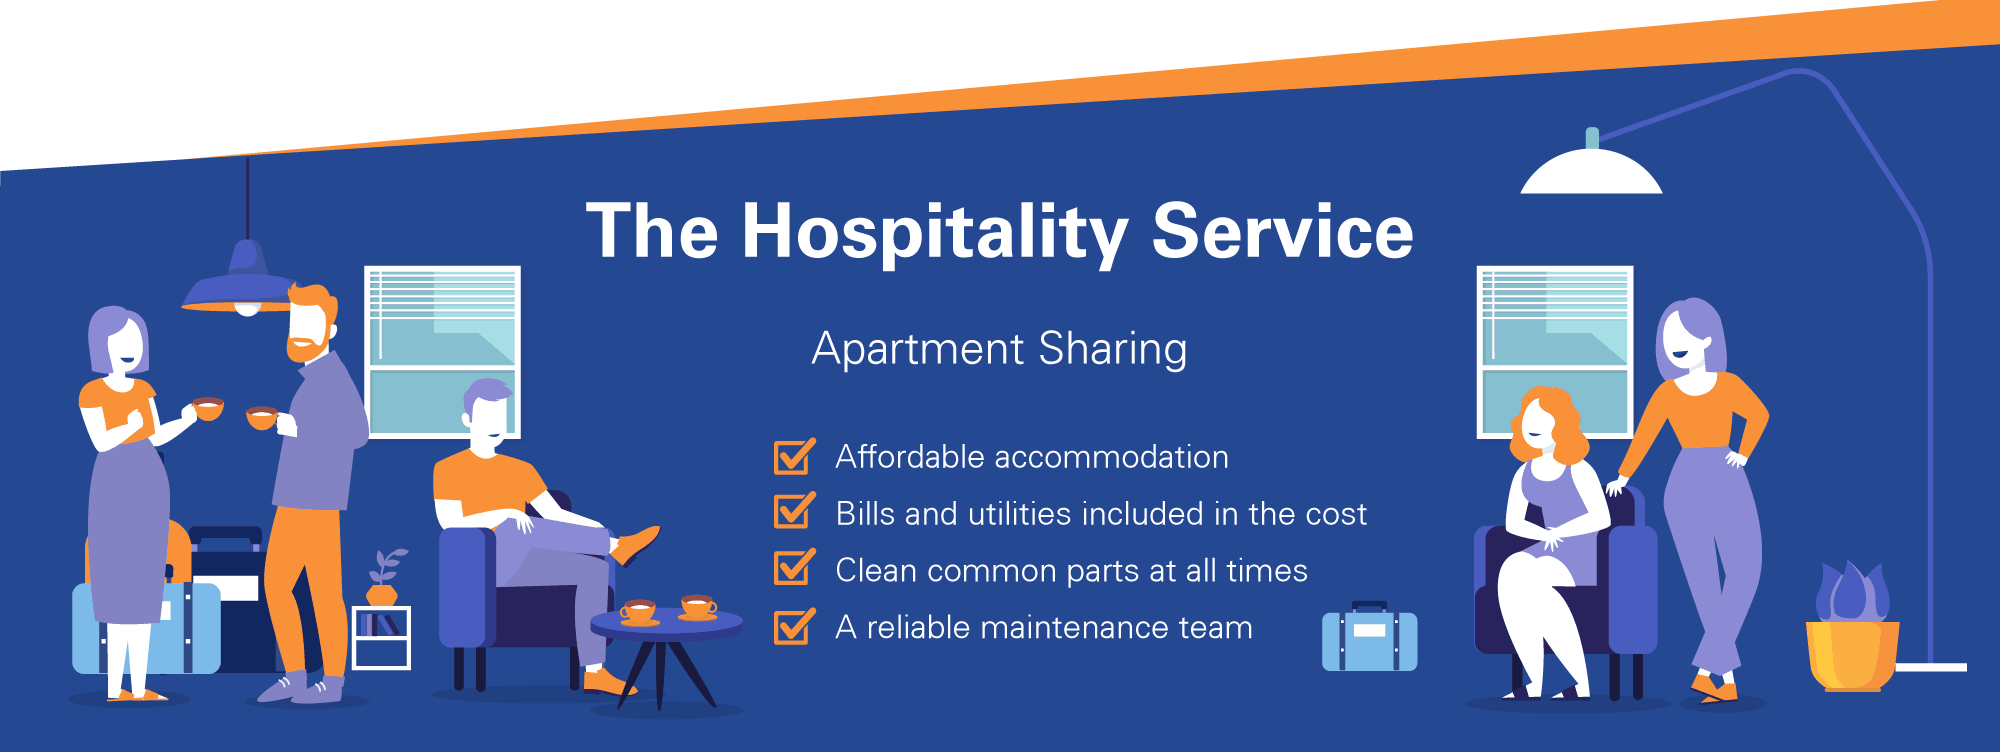 IP_HospitalityService_WebBanner